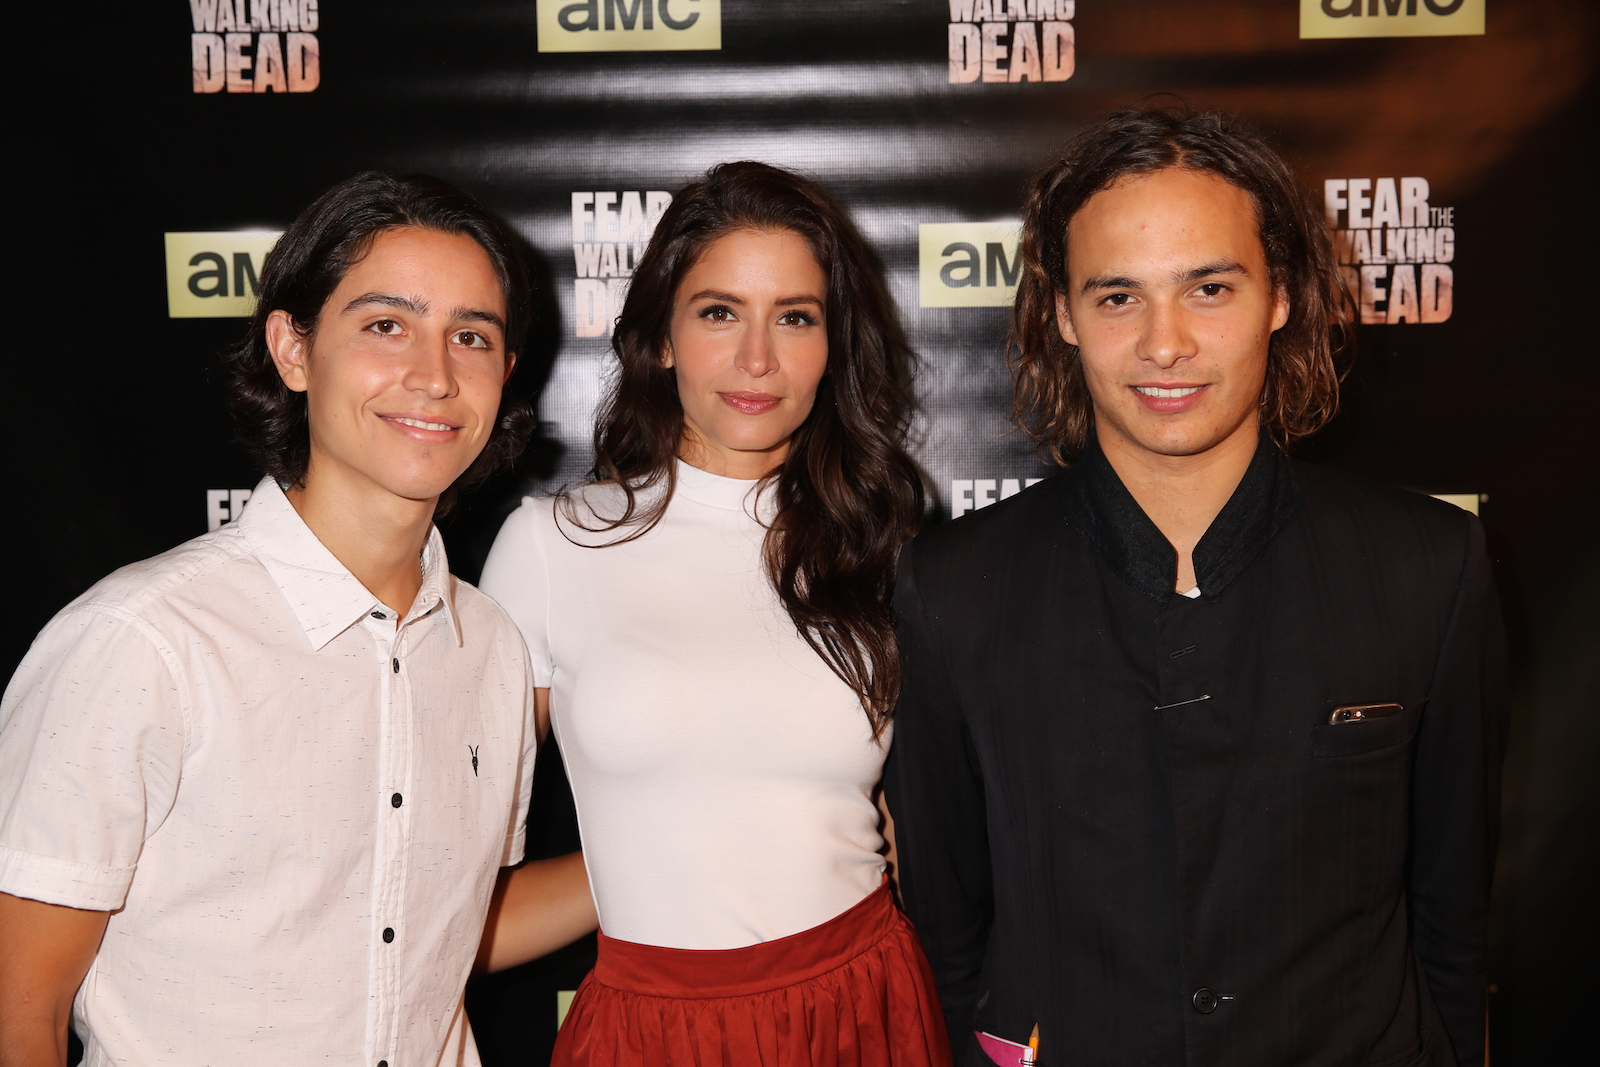 Fear the Walking Dead: Frank Dillane, Lorenzo James Henrie e Mercedes Mason al junket americano della serie